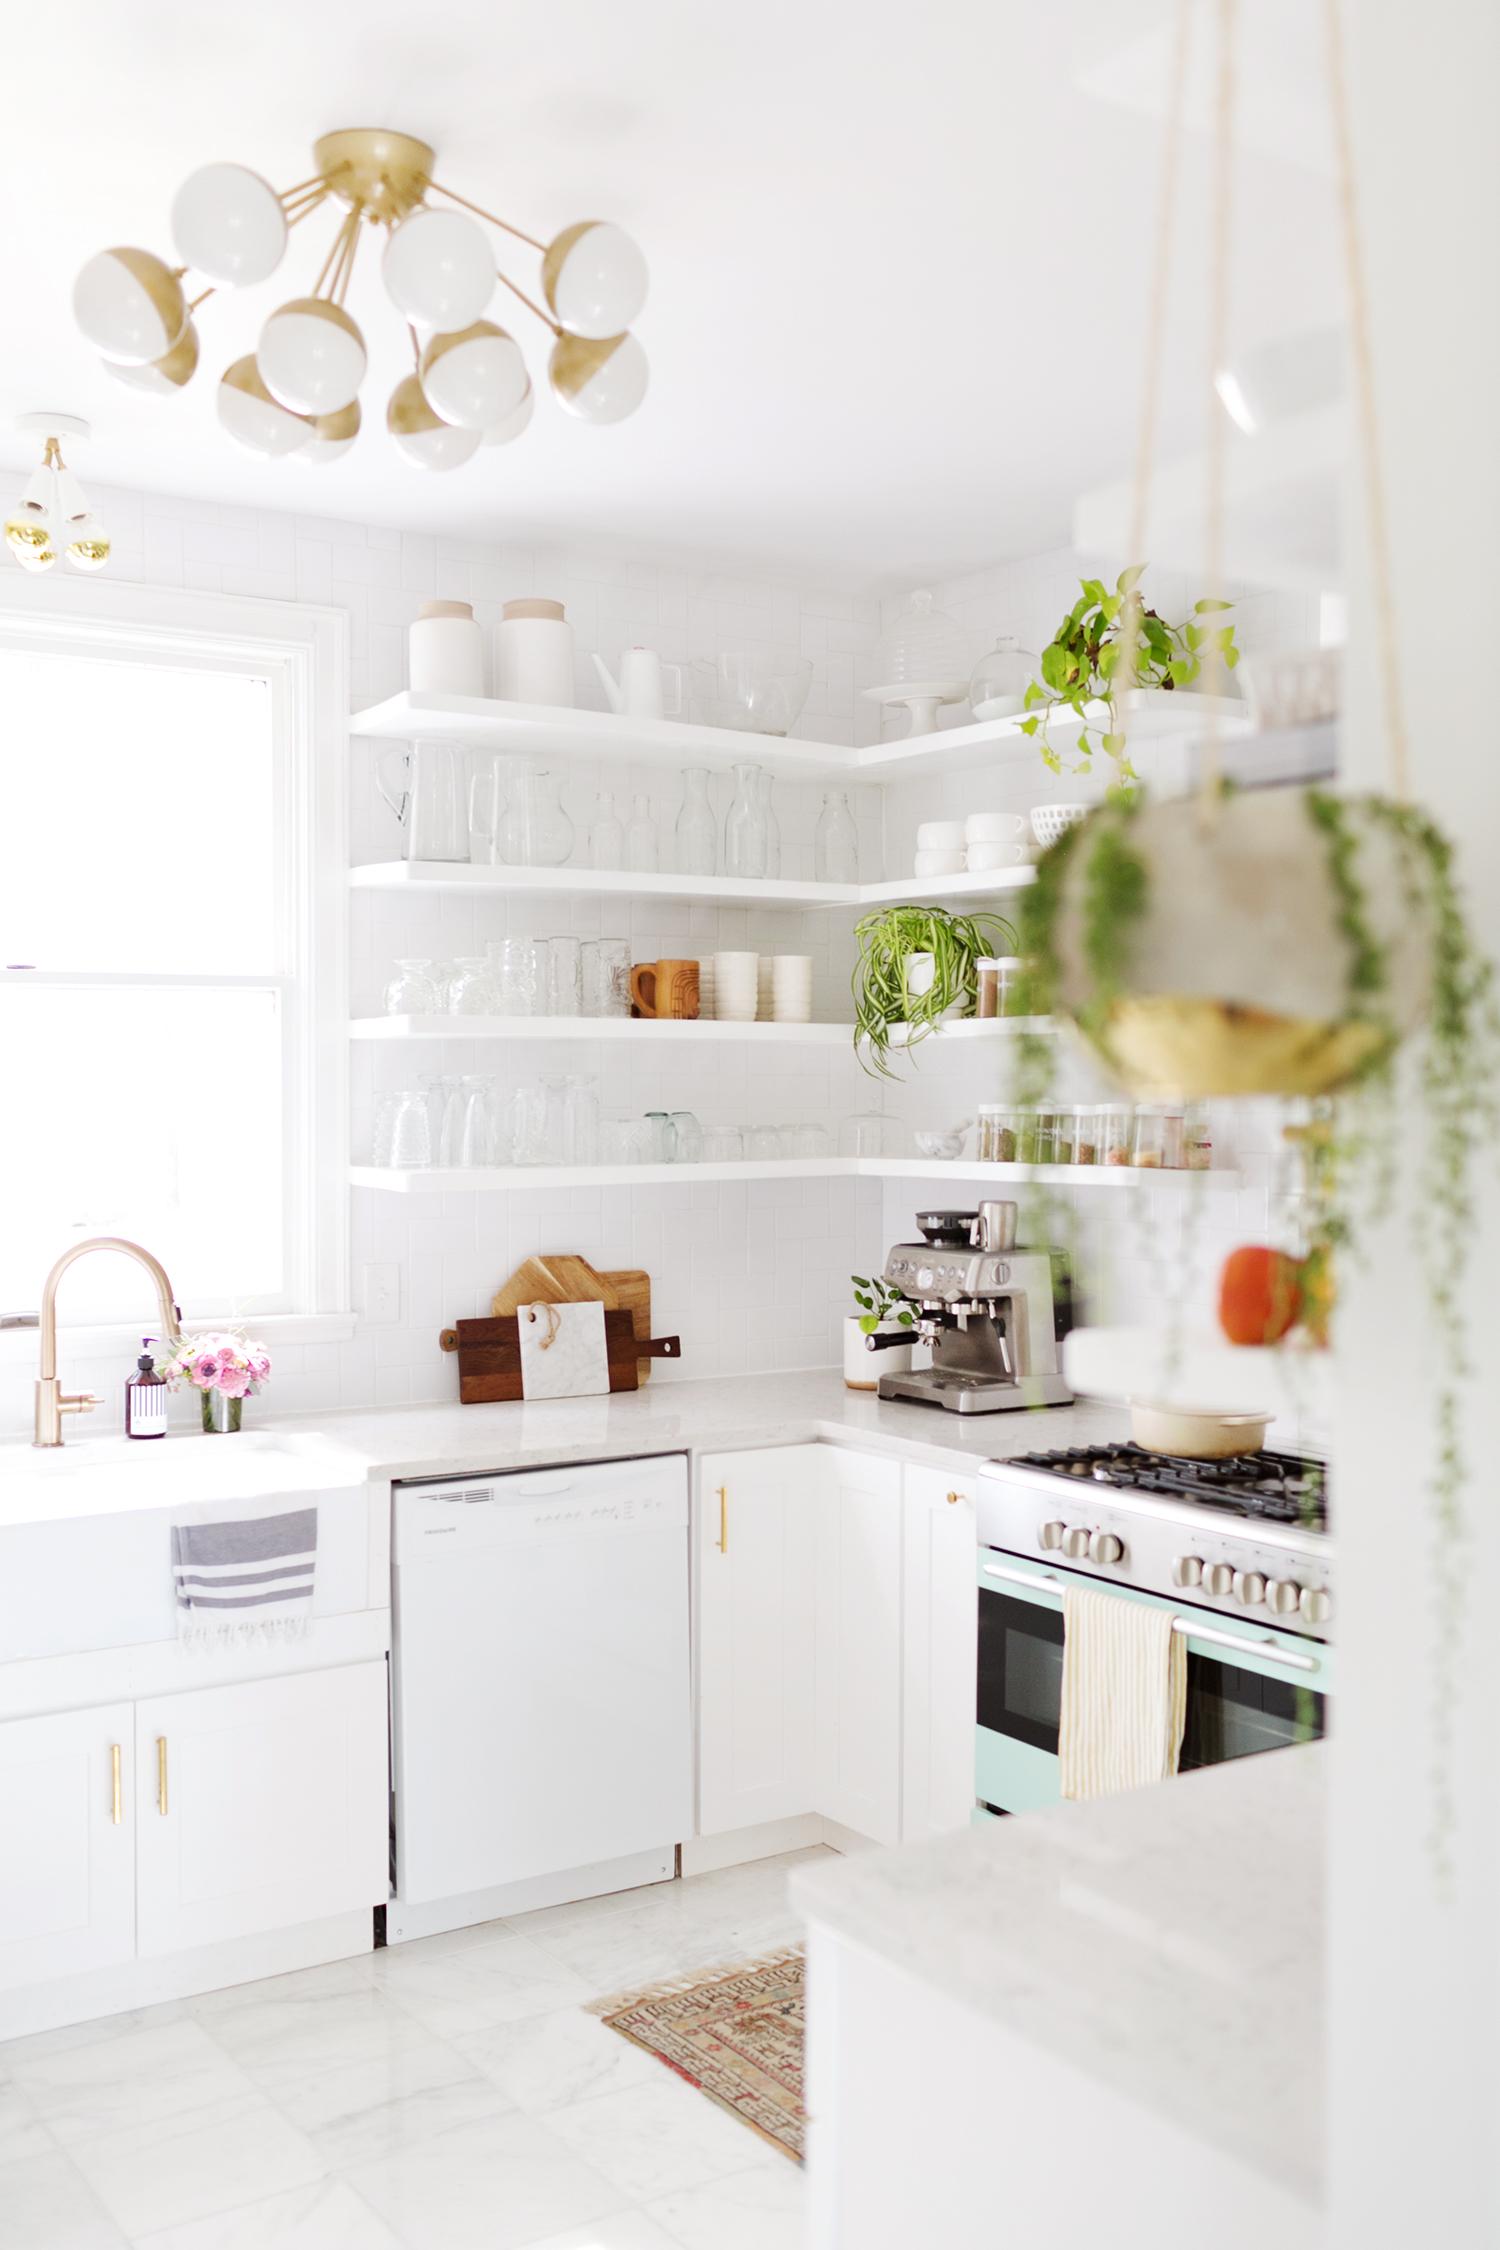 Elsie Larson's Kitchen Tour